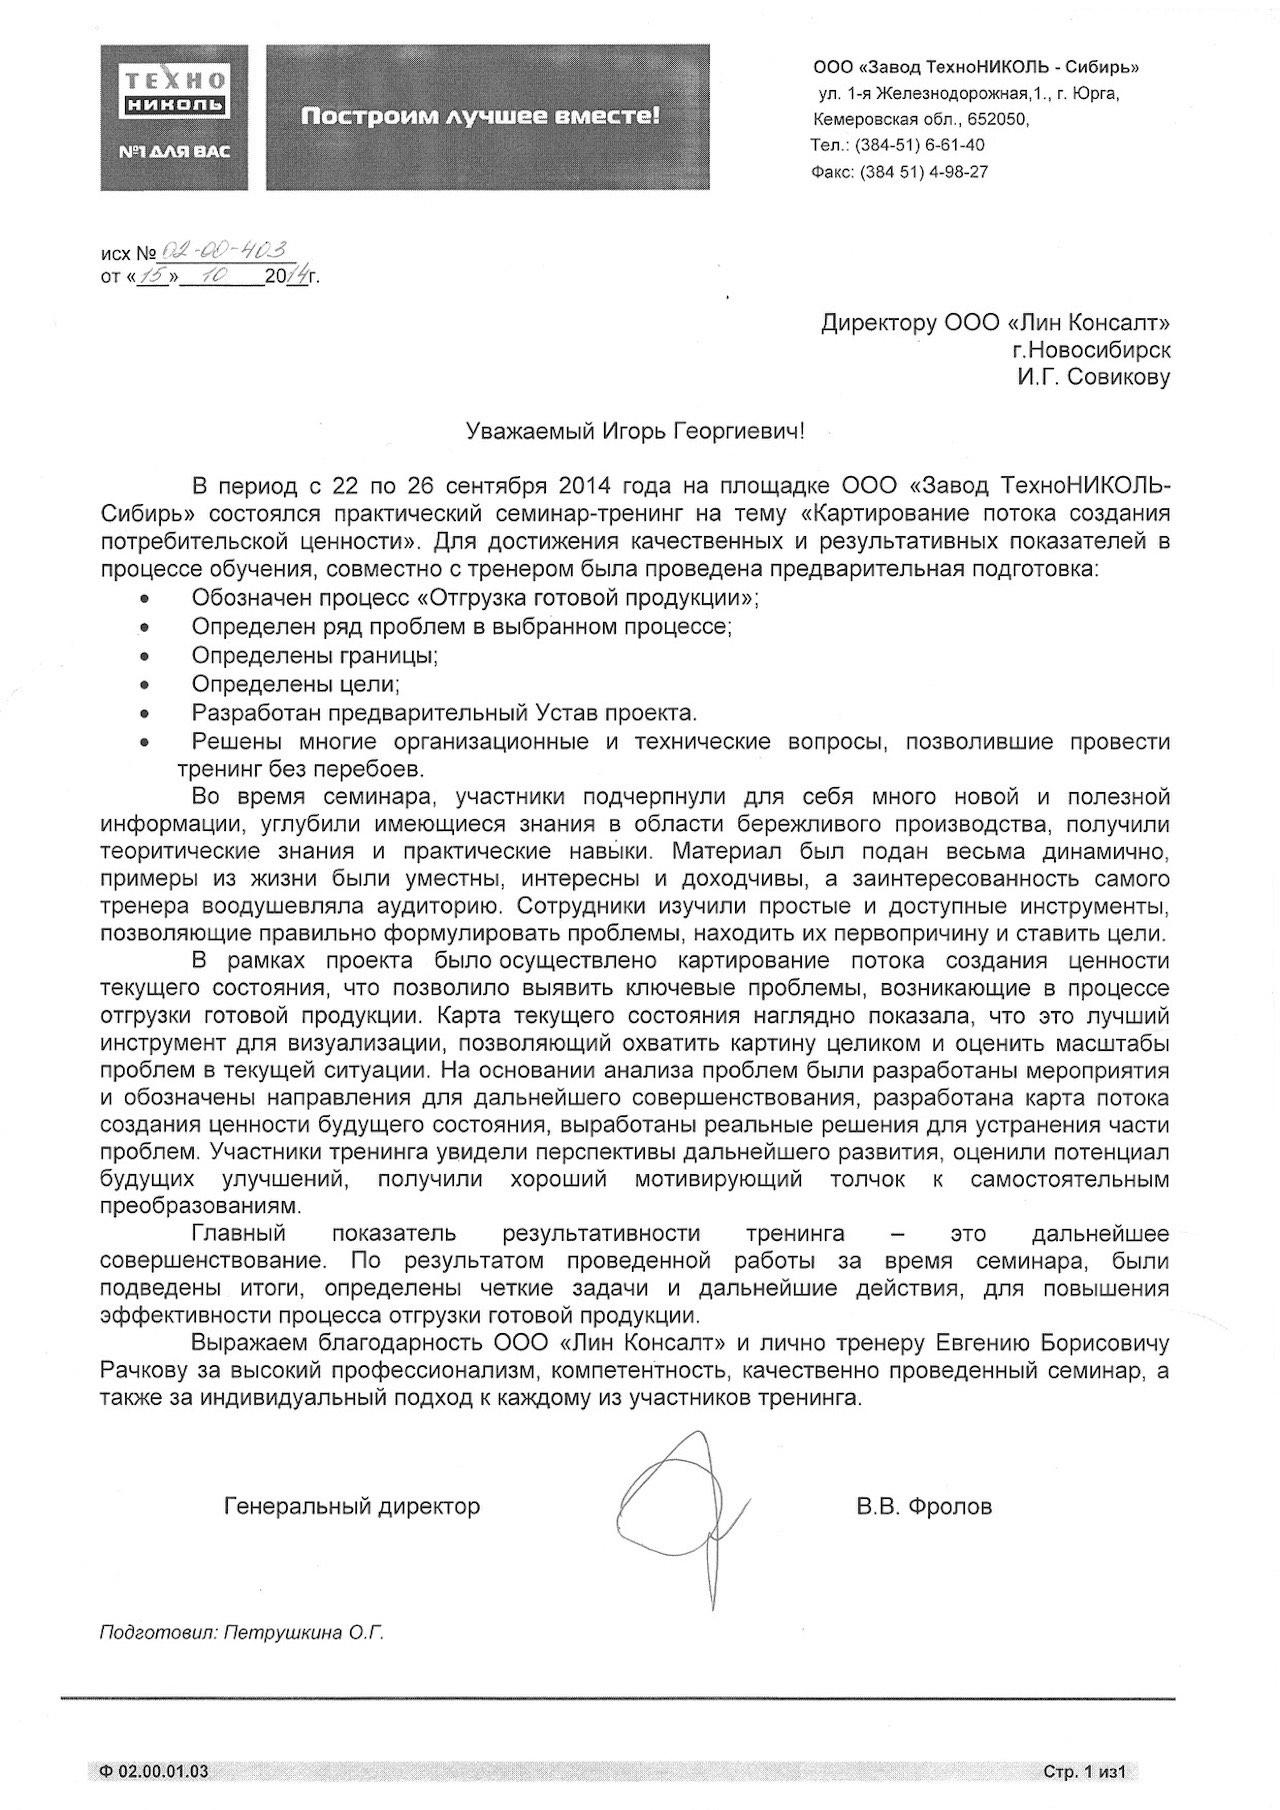 2014 - Отзыв ТехноНИКОЛЬ